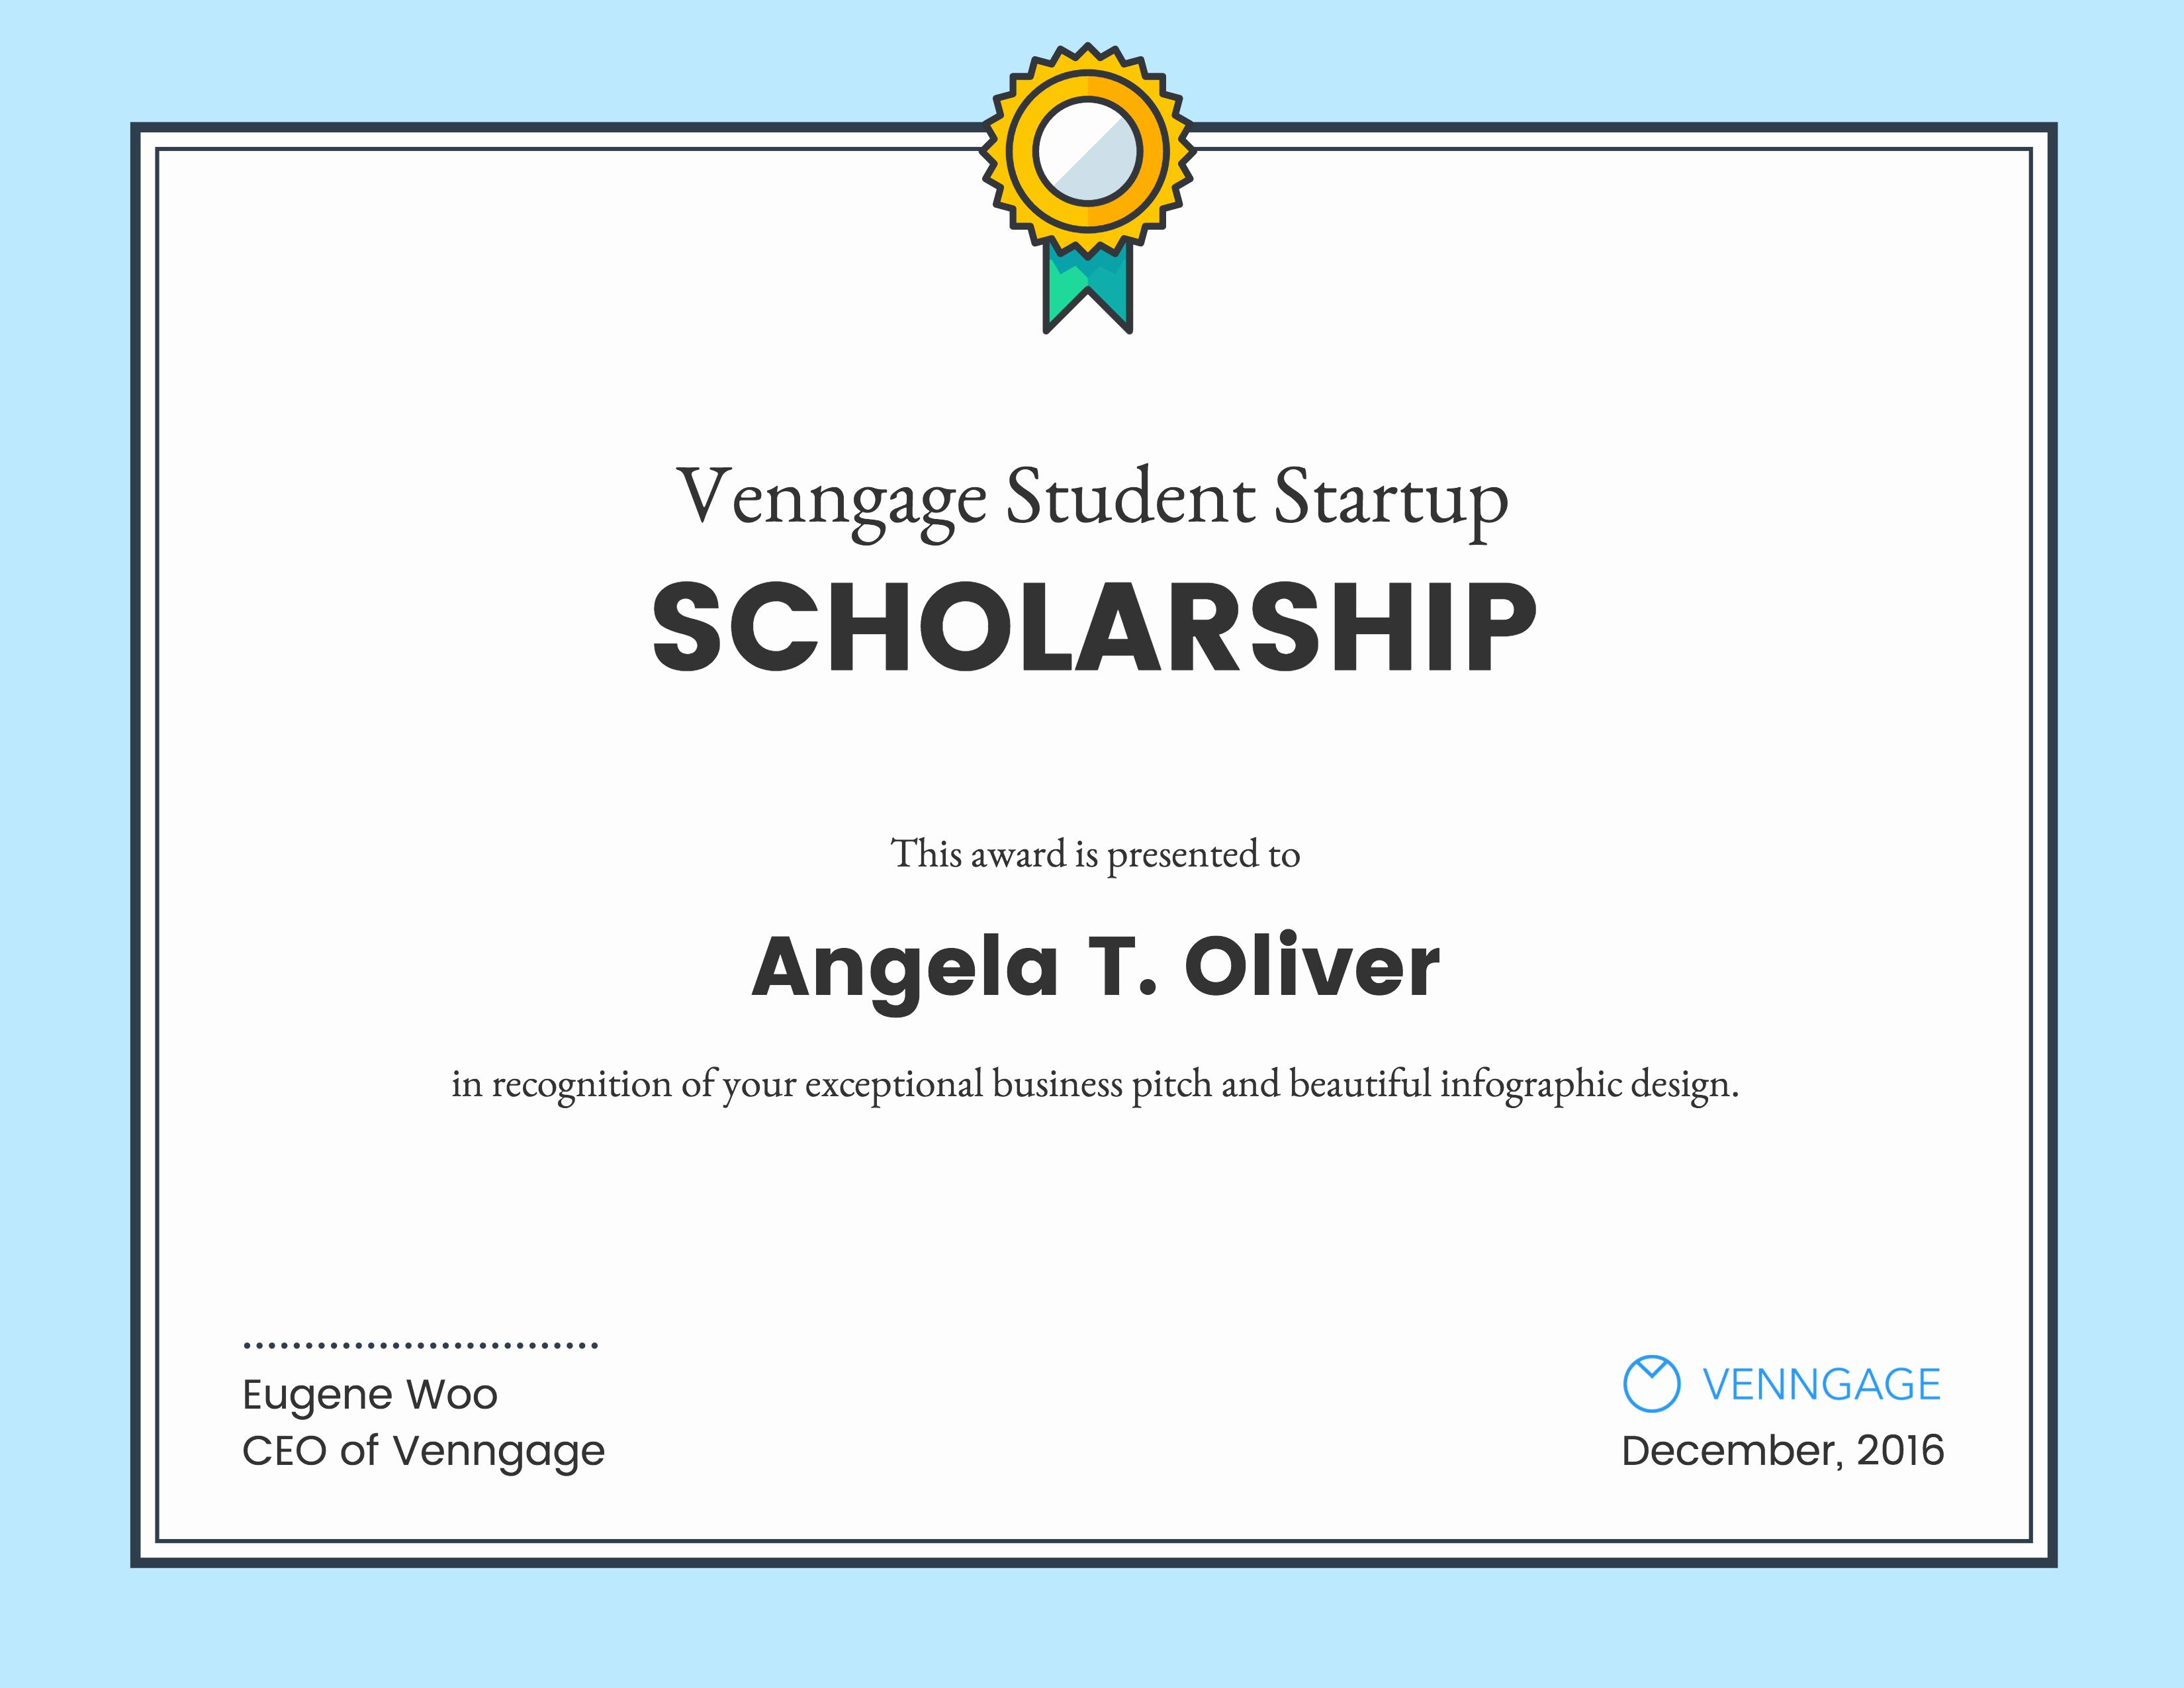 Scholarship Award Certificate Templates New Venngage Student Scholarship Winners Venngage